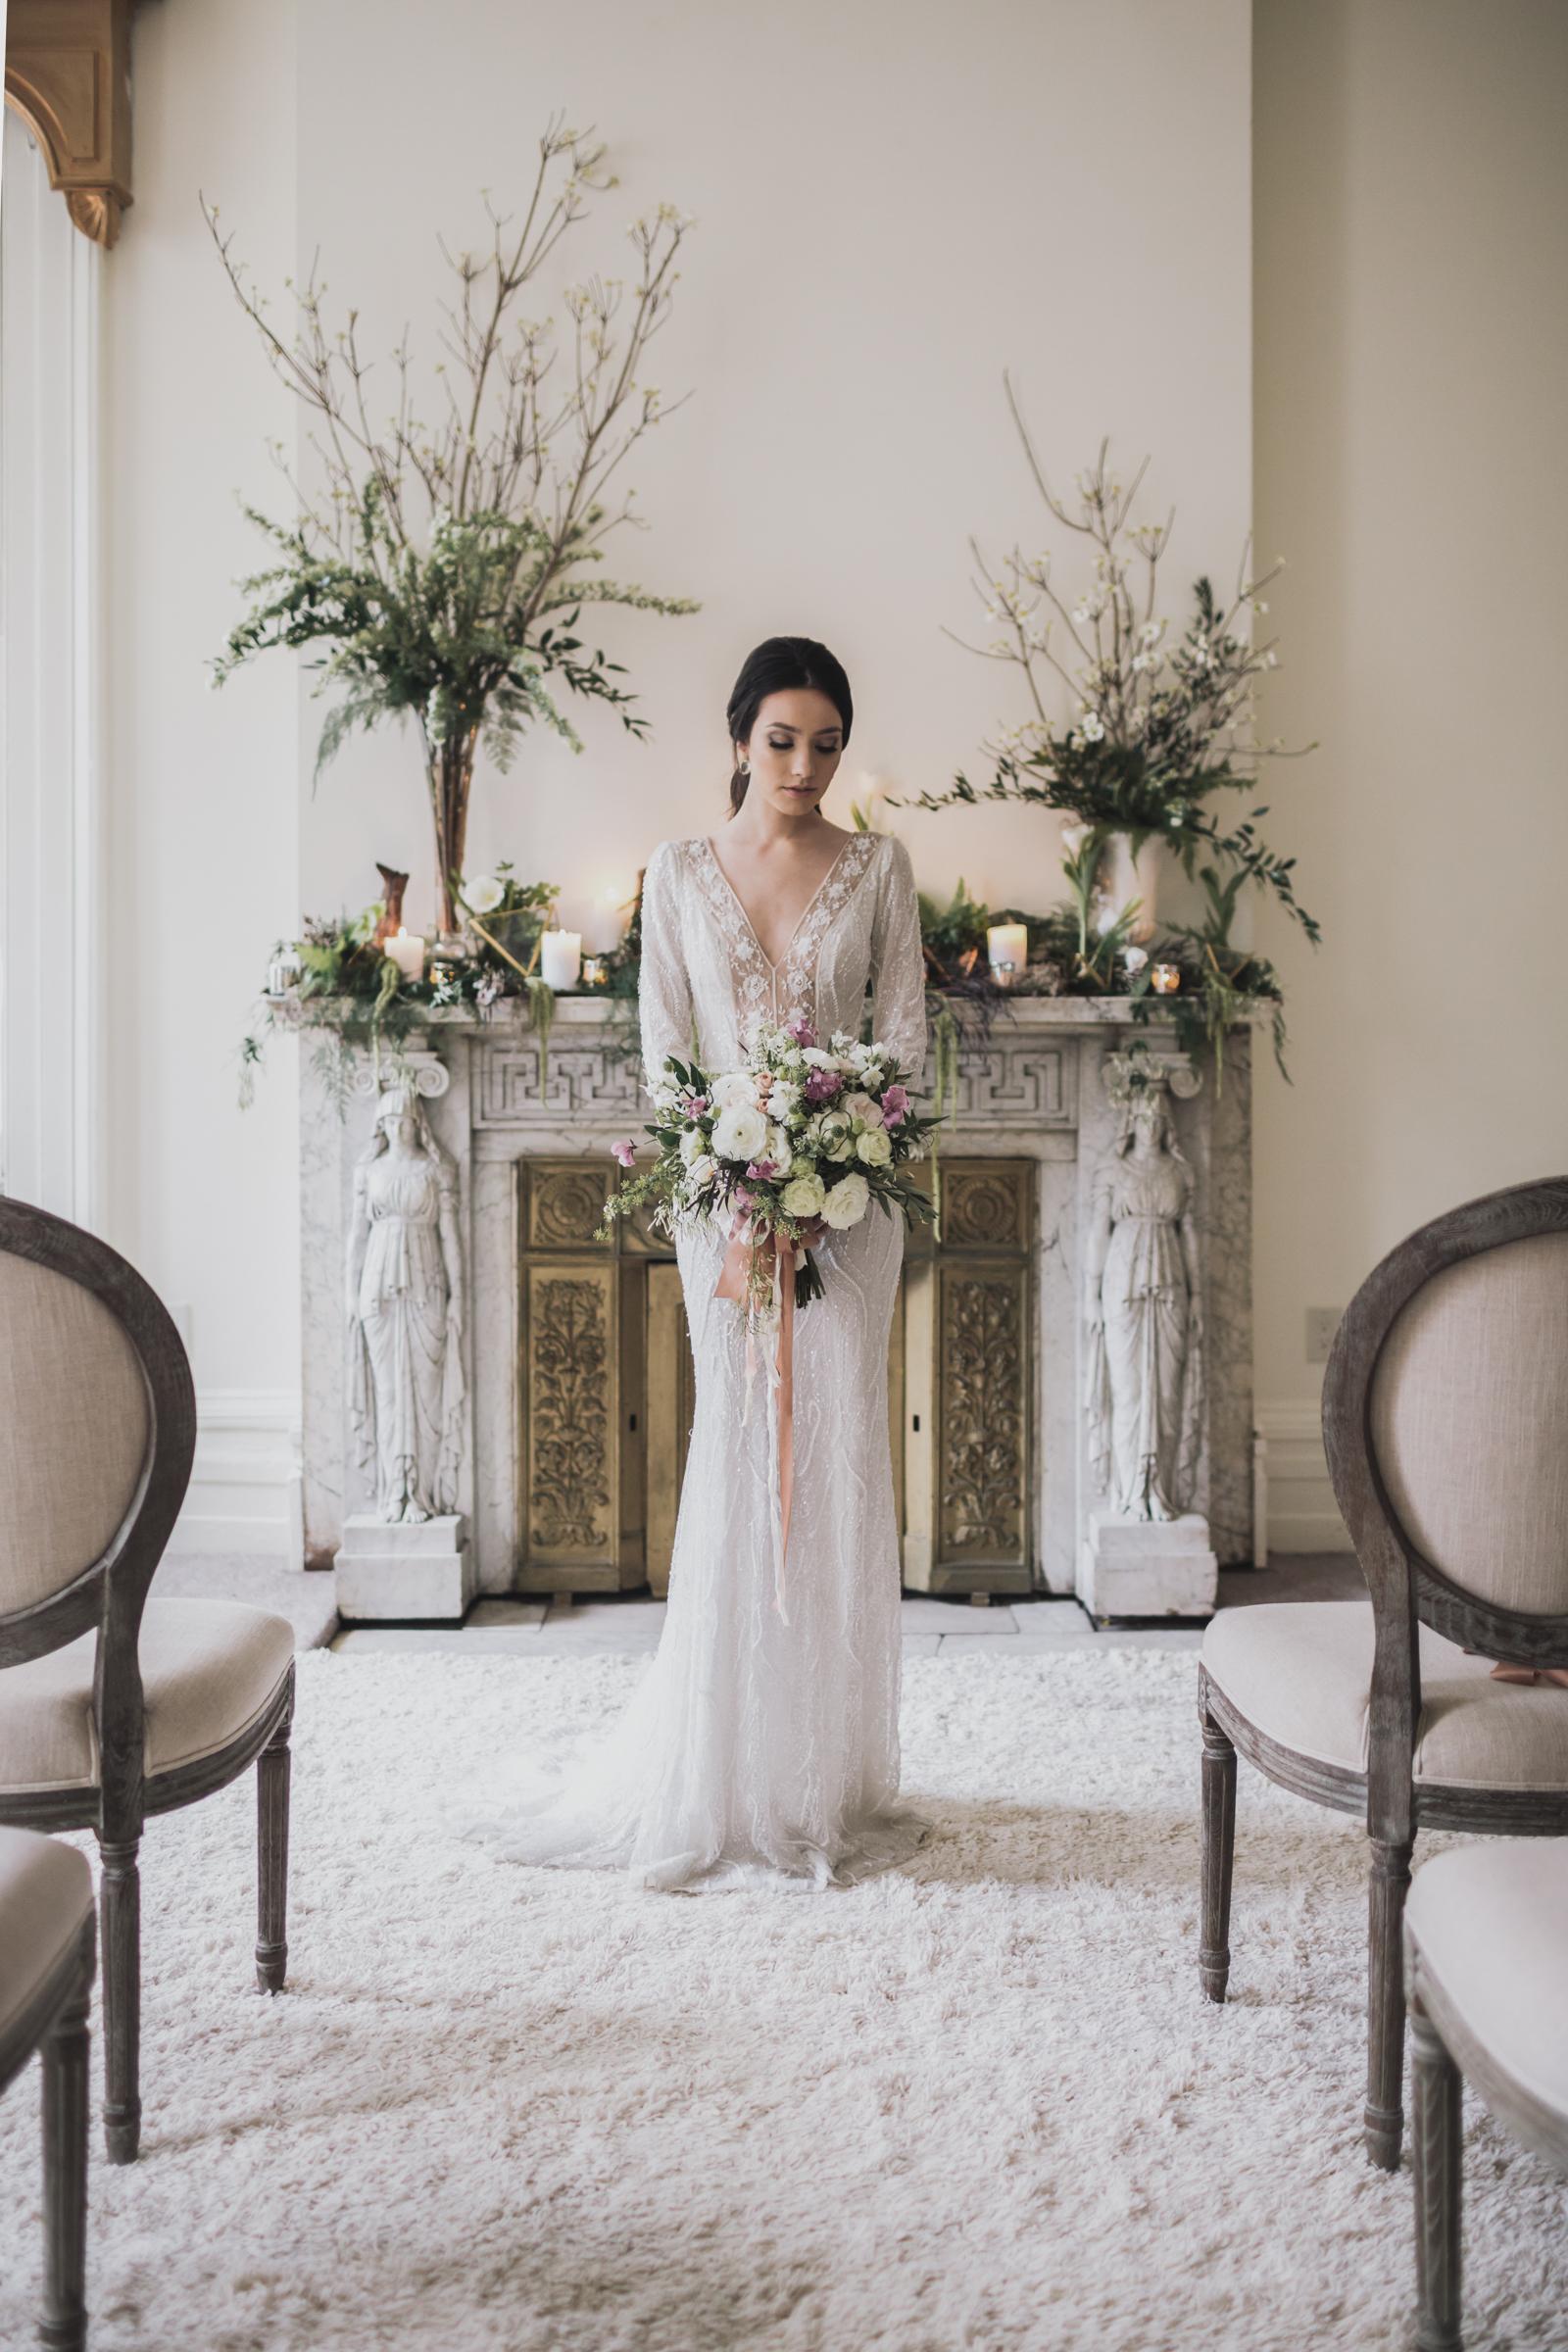 20160310-040-Barrow_Mansion_Wedding_Editorial.jpg